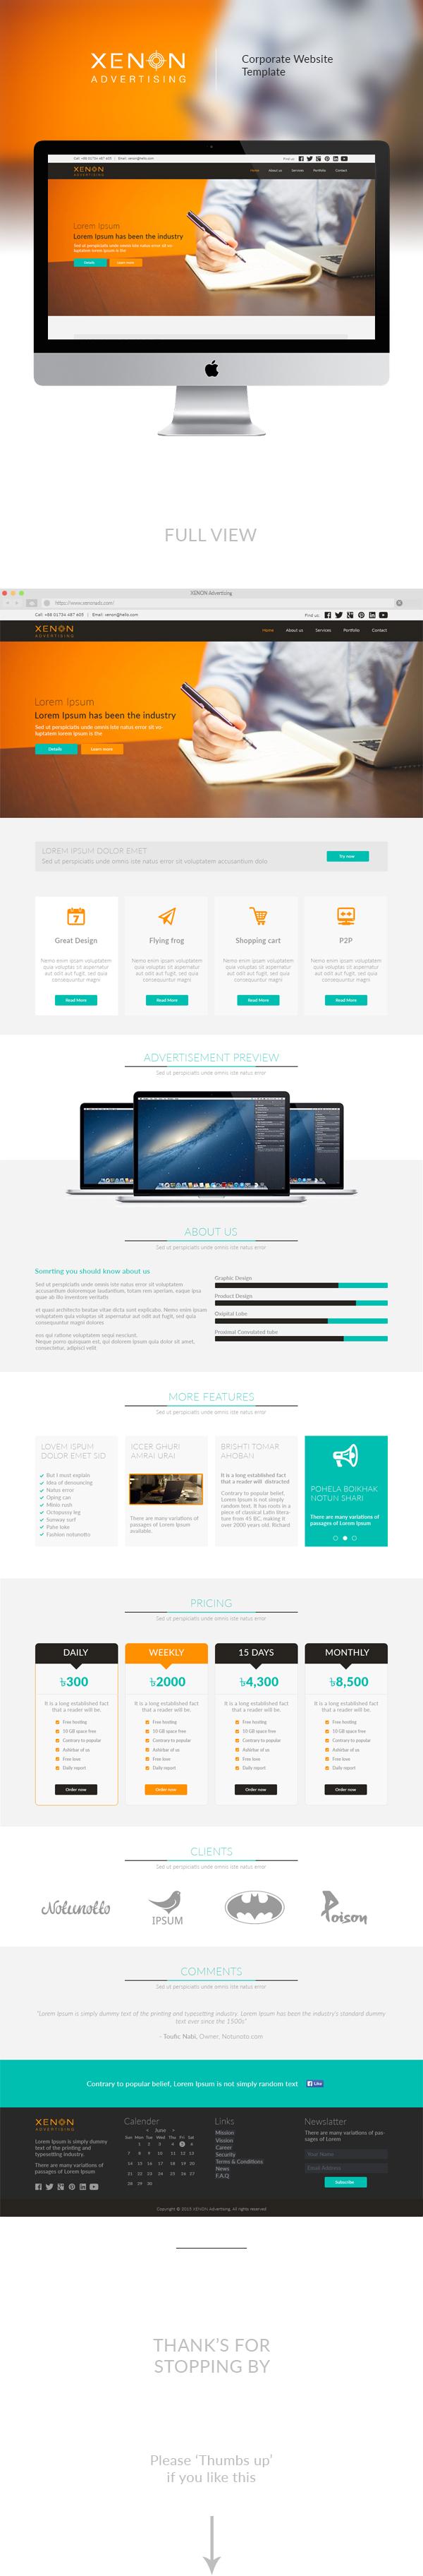 Website webpage UI ux modern Clean Design creative corporate Plain flat design new company brand cool colorful